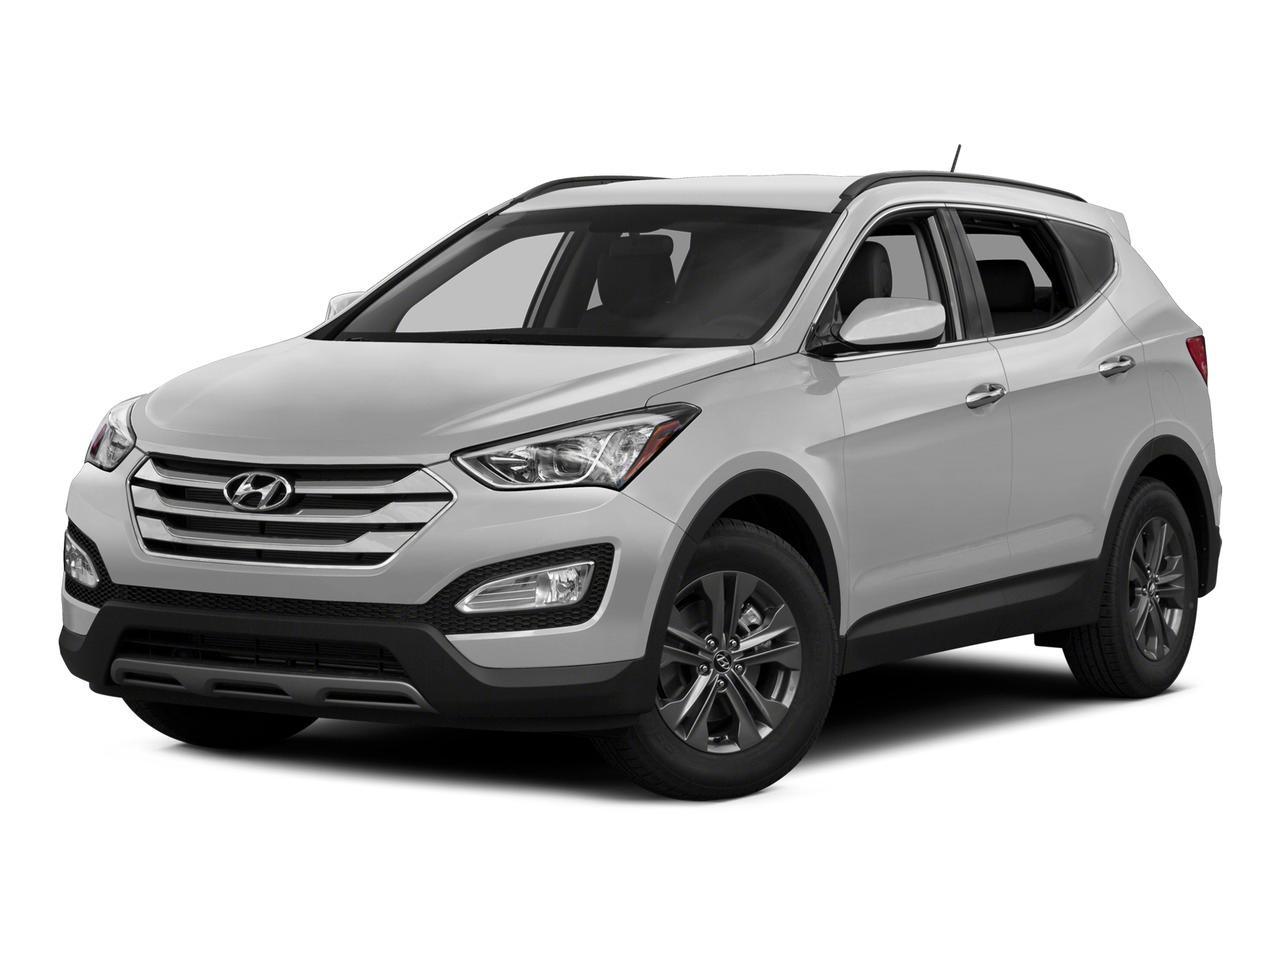 2015 Hyundai Santa Fe Sport Vehicle Photo in Moon Township, PA 15108